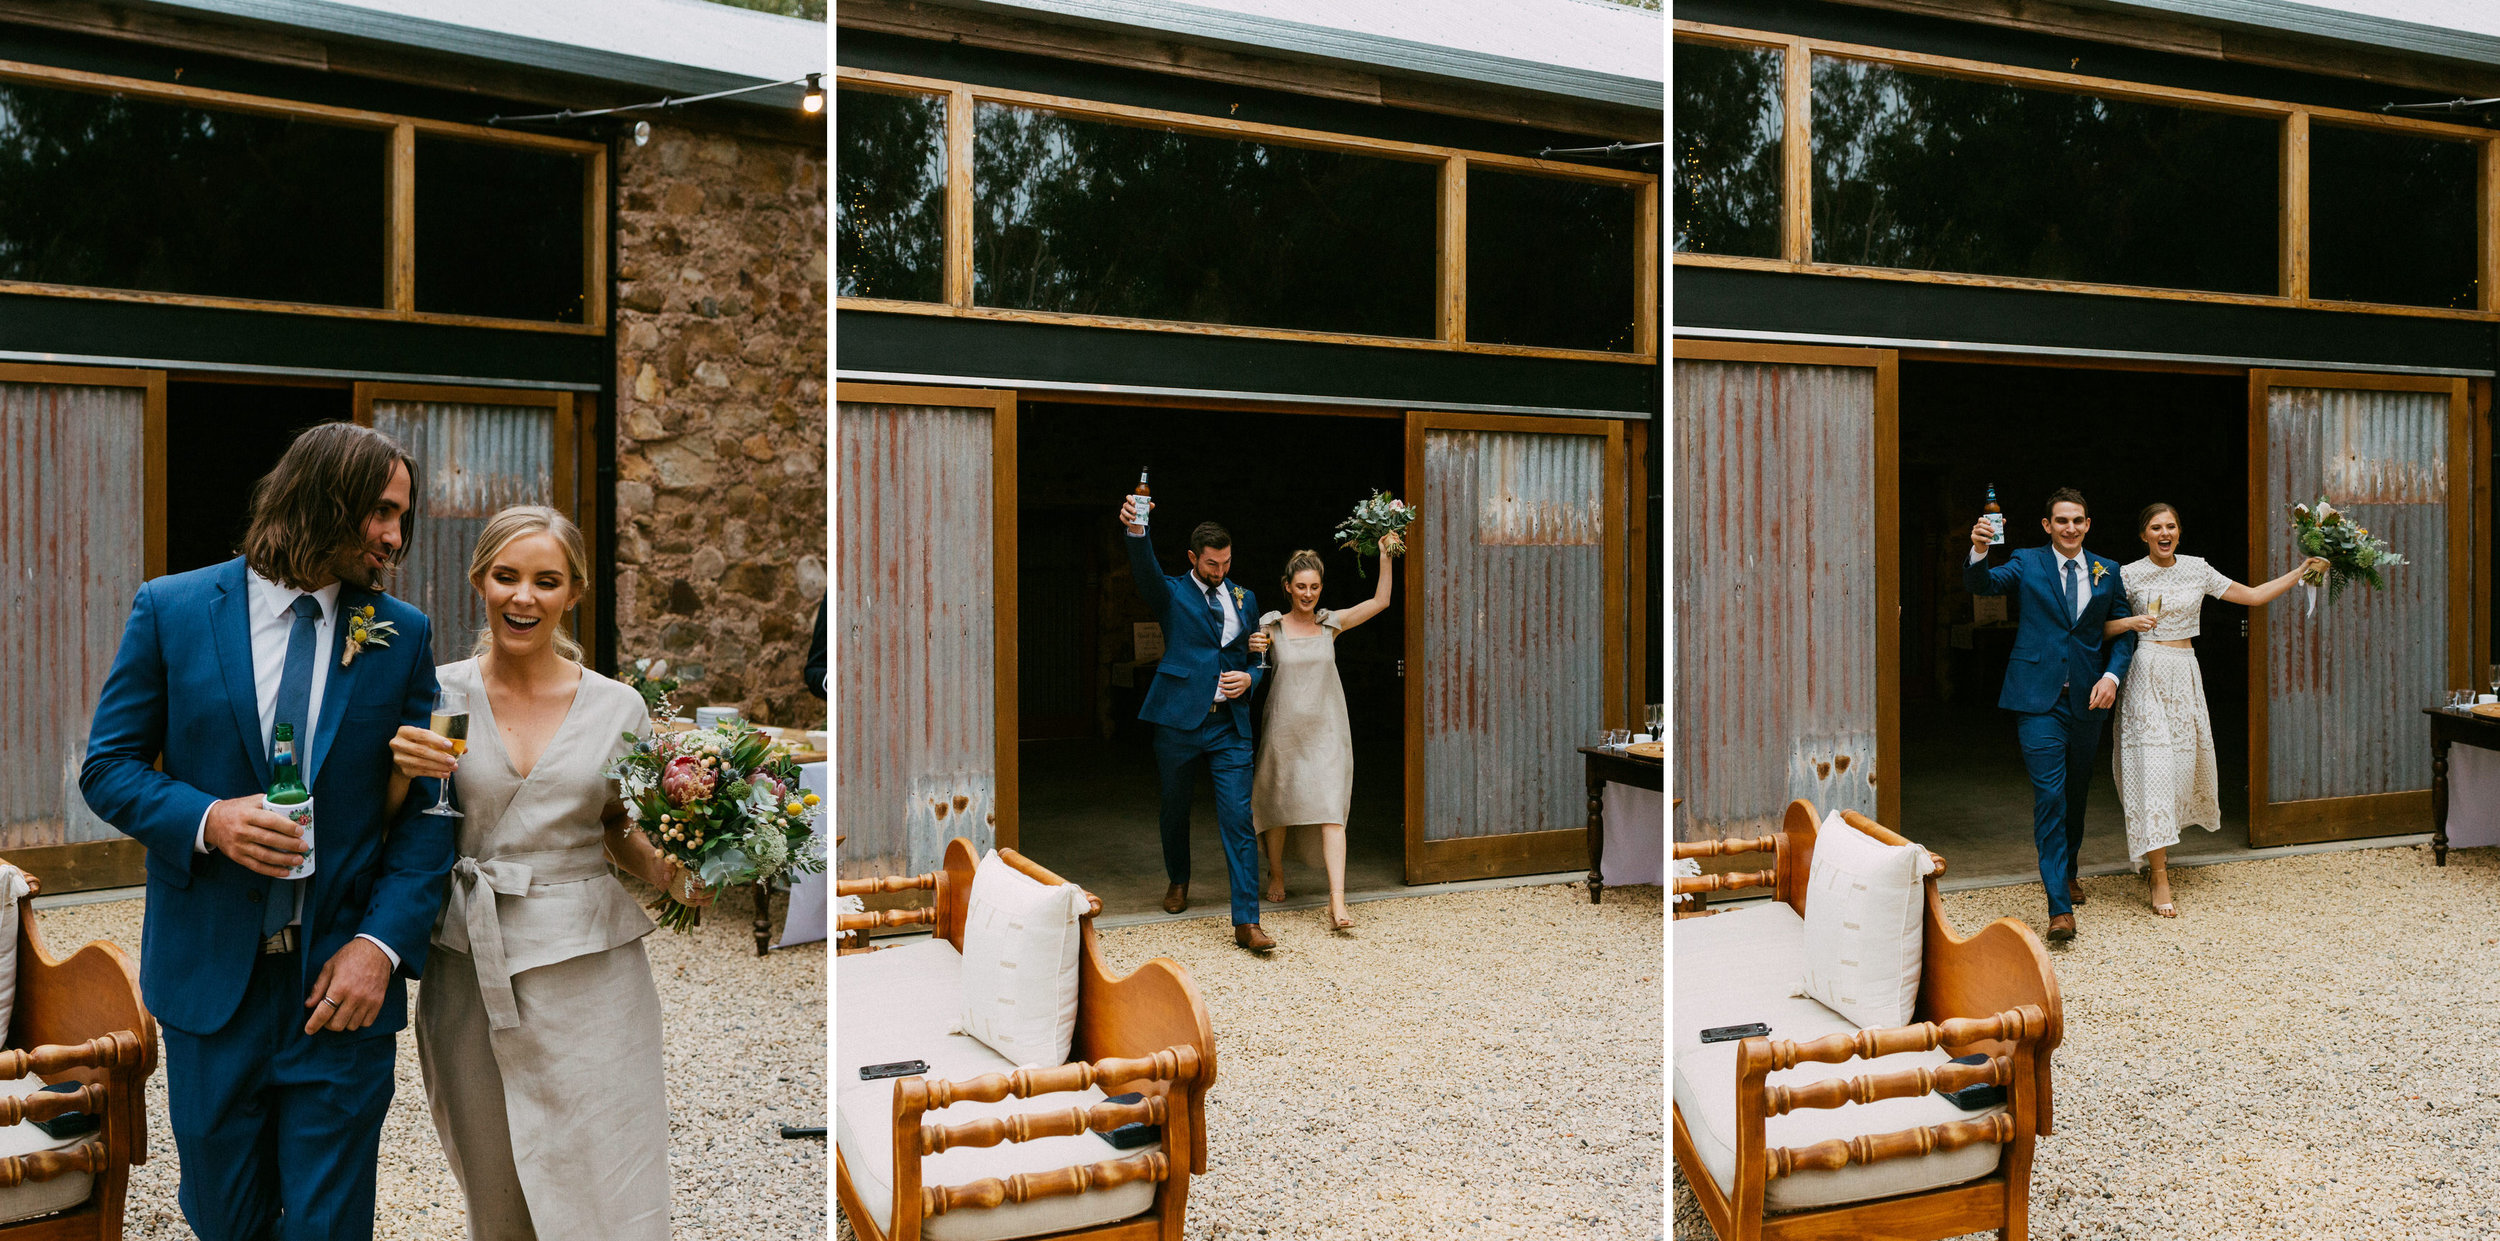 Relaxed Barn1890 Wedding 114.jpg